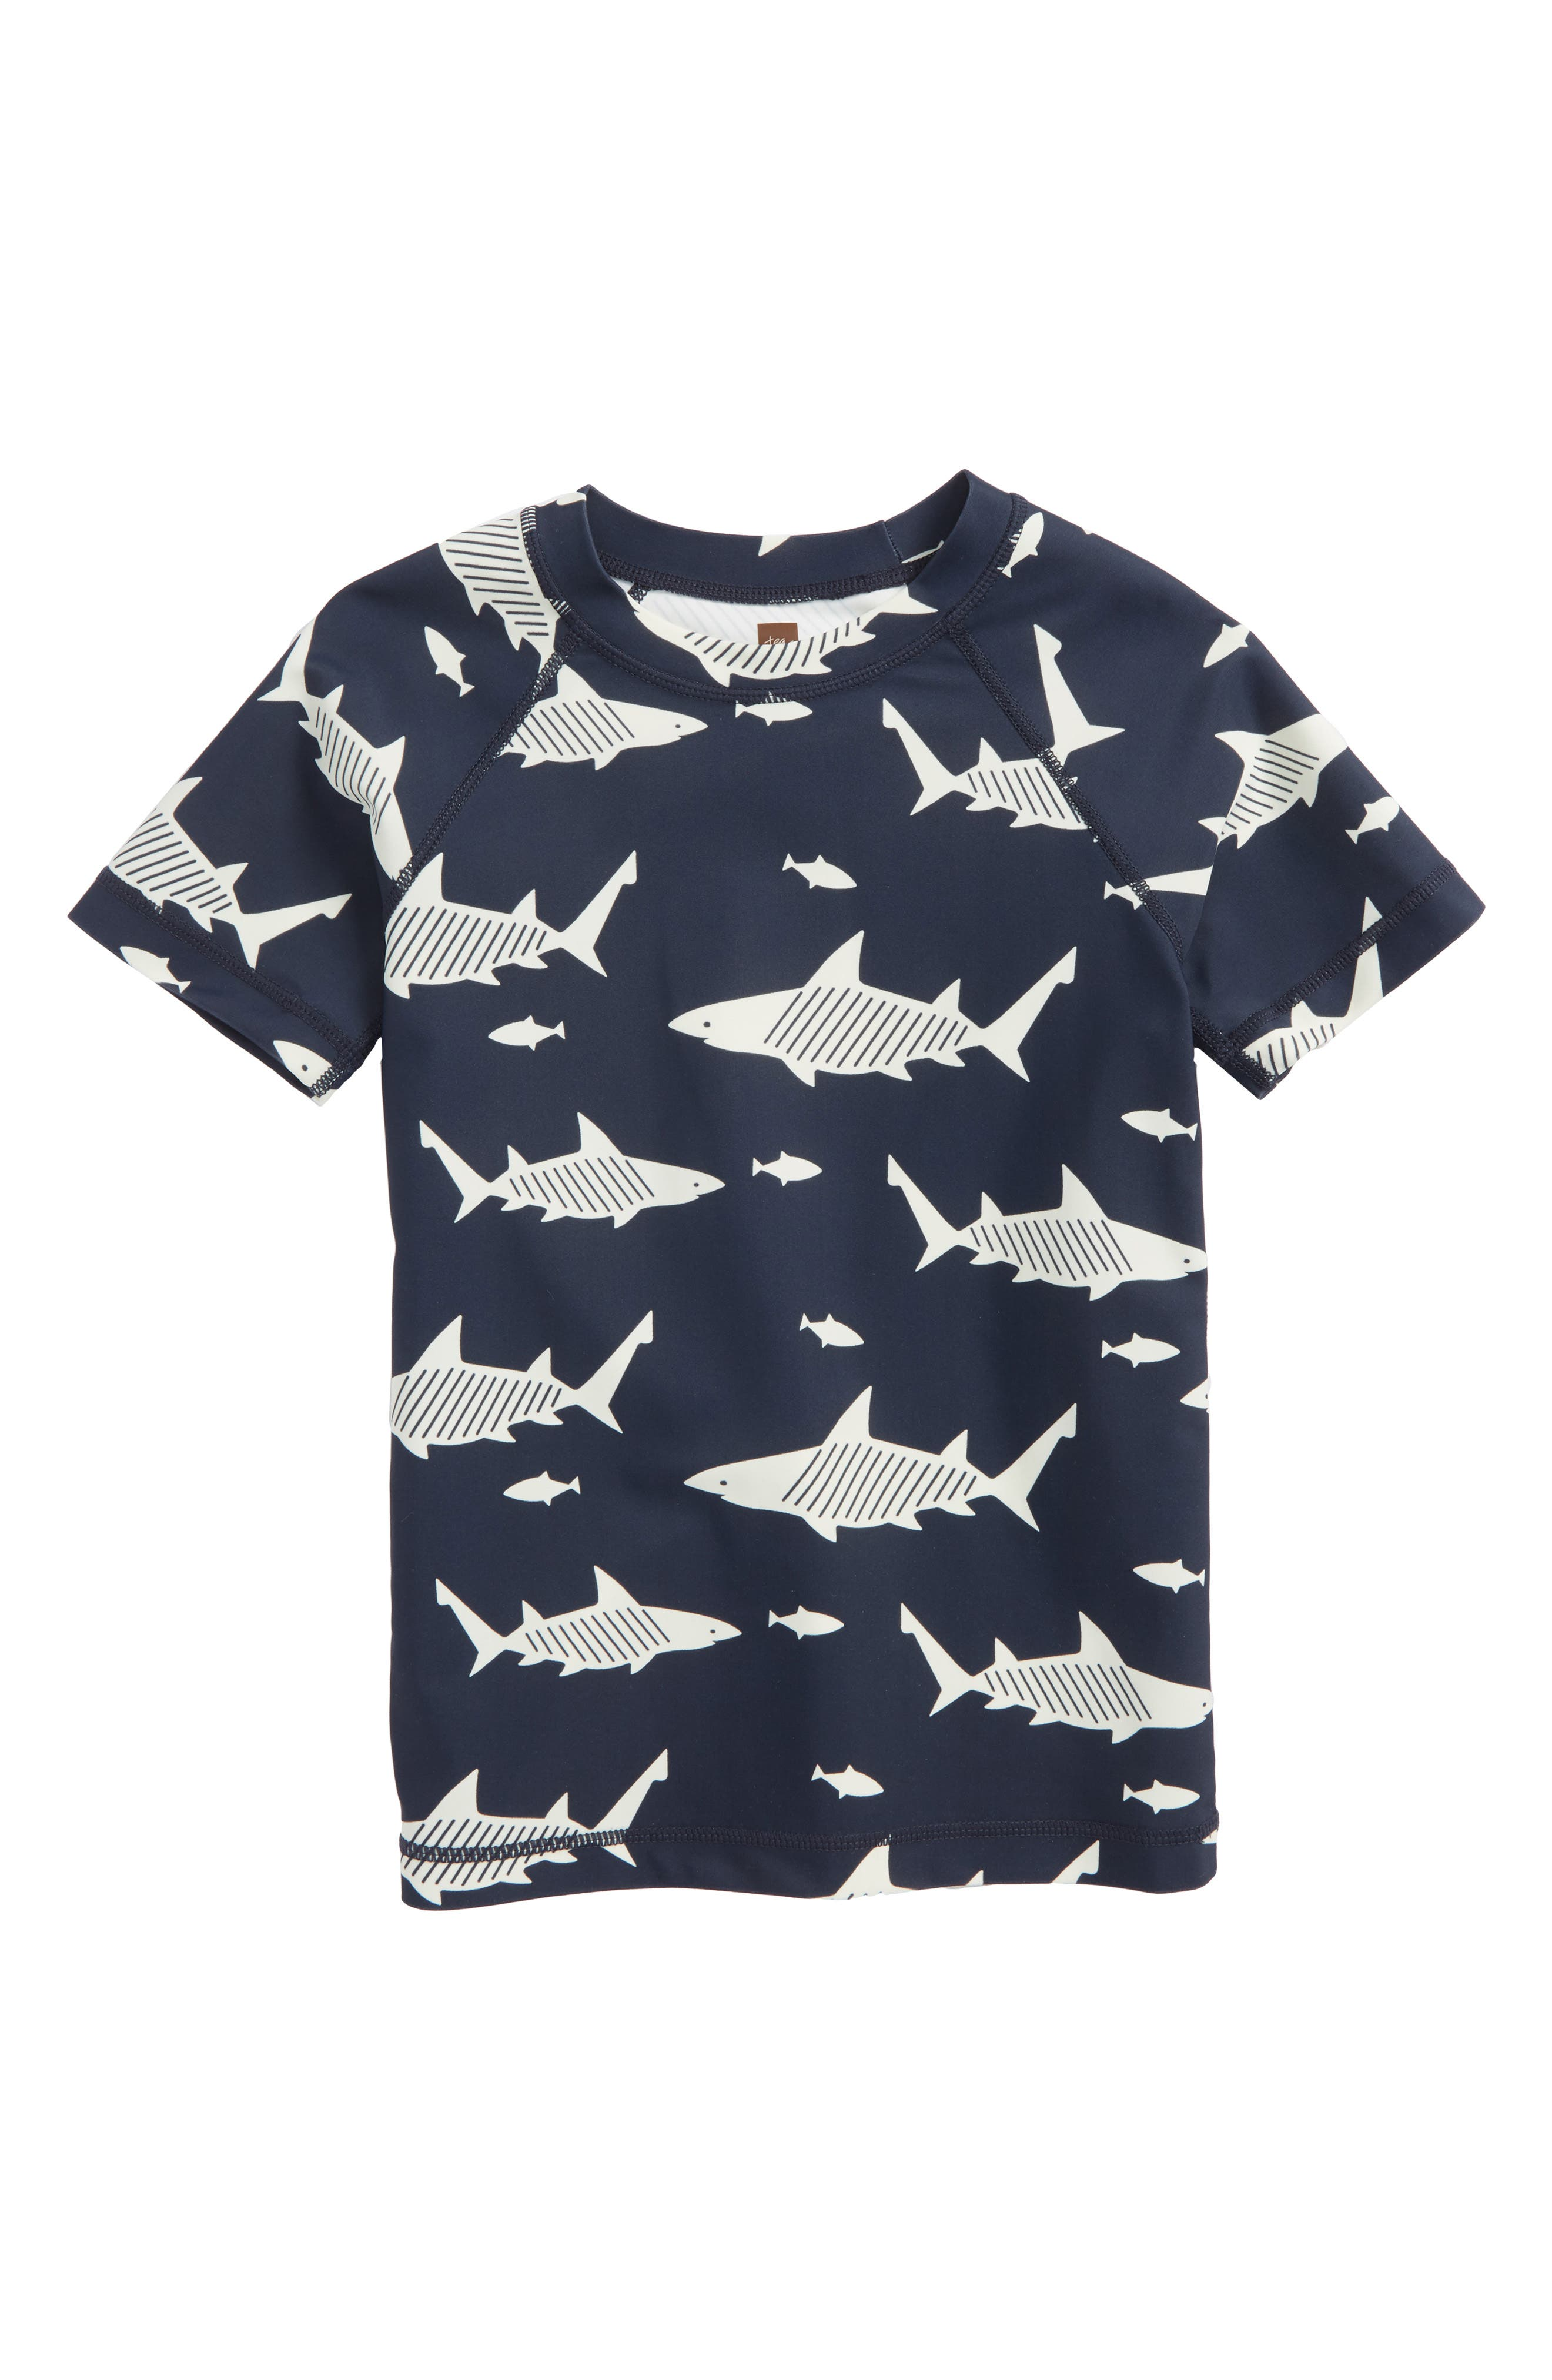 Shark Short Sleeve Rashguard,                             Main thumbnail 1, color,                             411